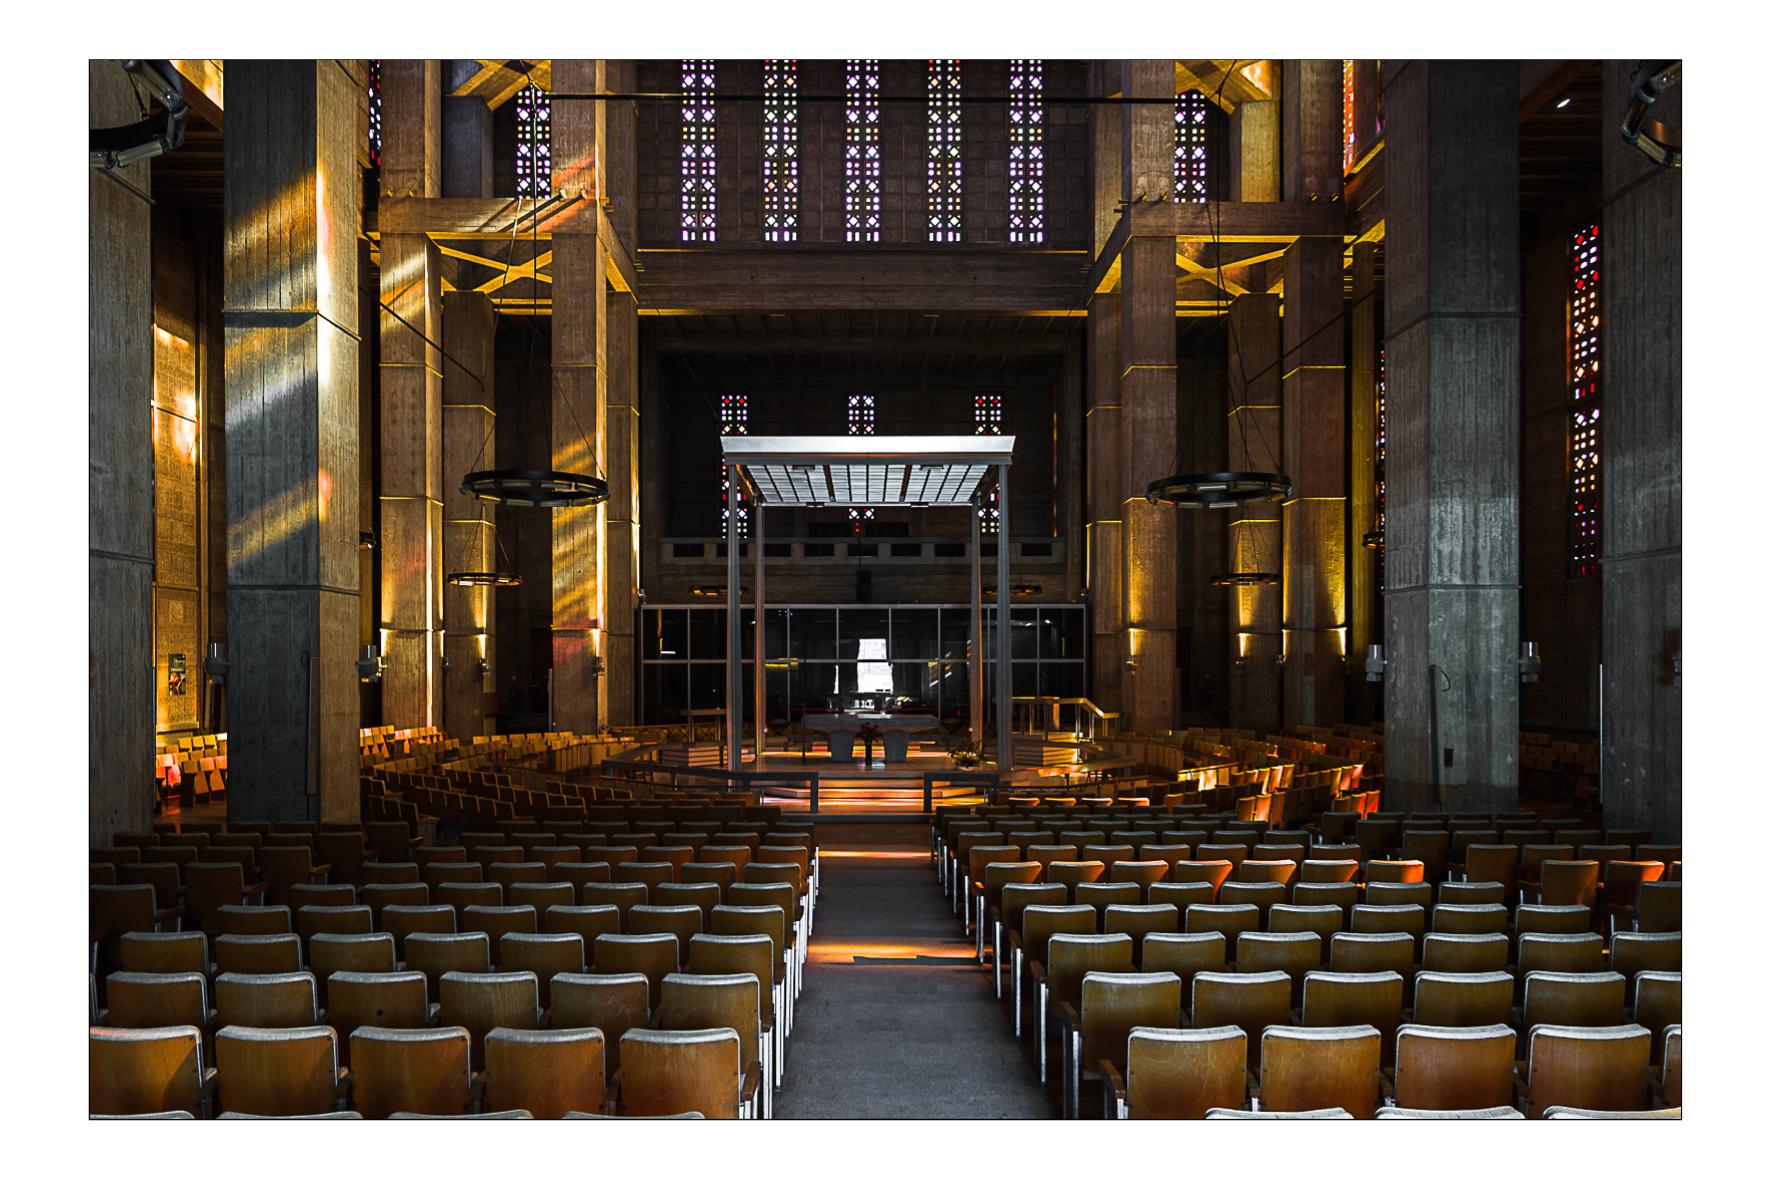 Eglise Saint-Joseph, Le Havre 2011.  Auguste Perret,Raymond Audigier architectes.